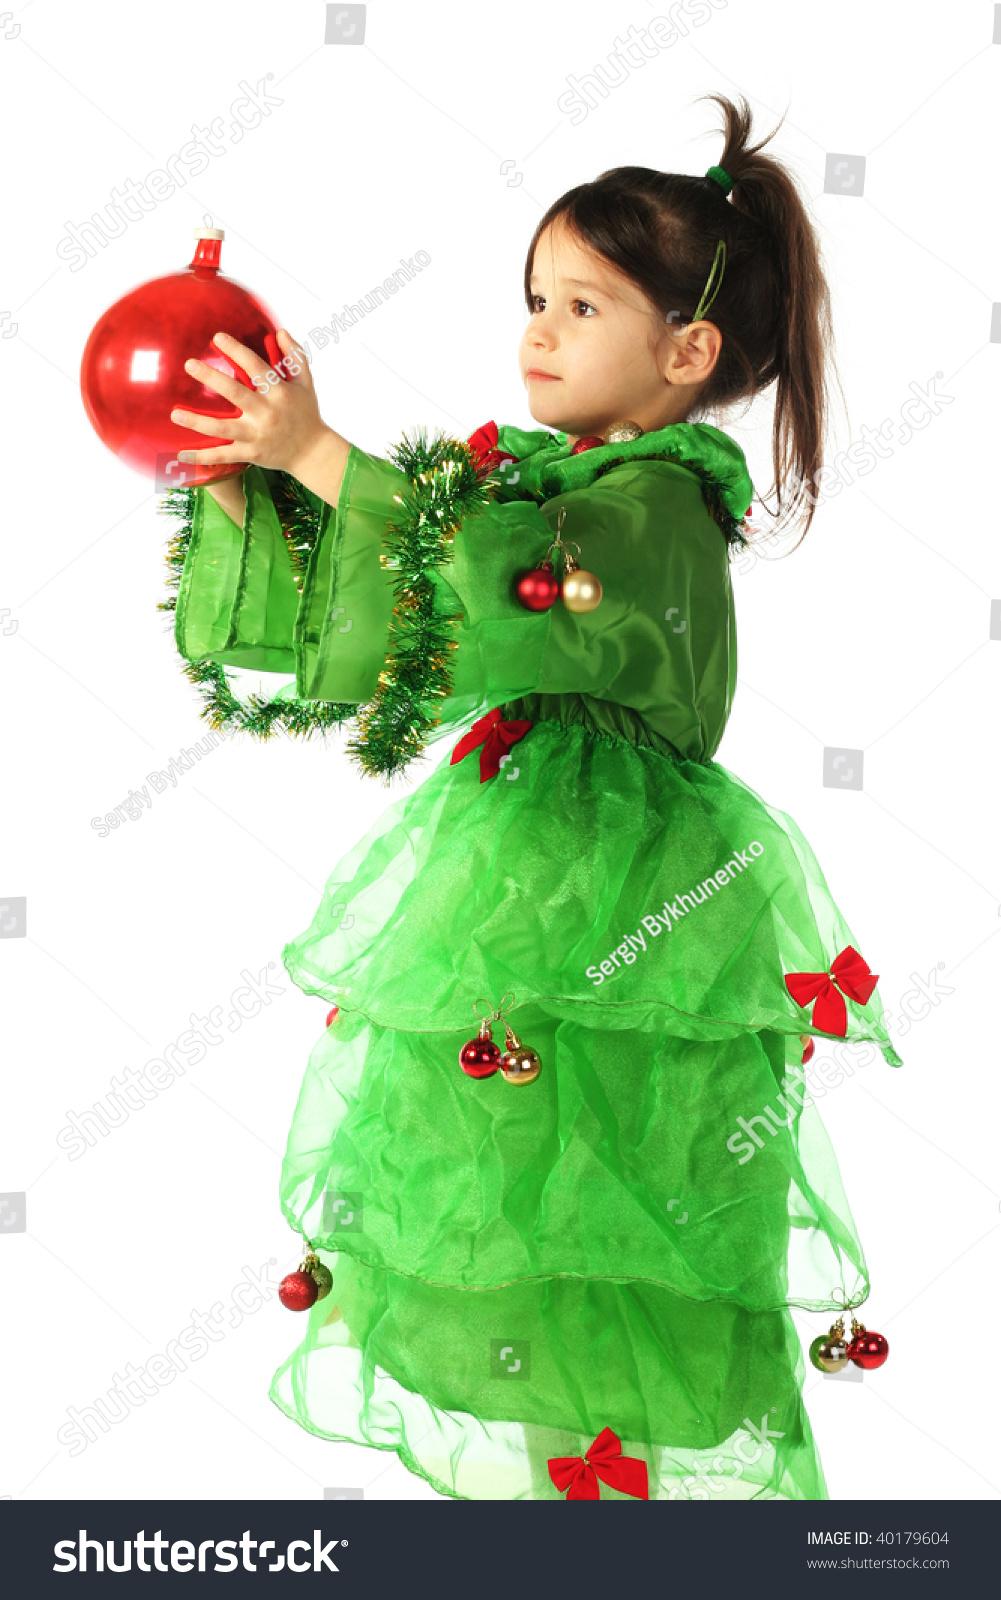 Toddler Christmas Tree Costume.Little Smiling Girl Green Christmas Tree Stock Photo Edit